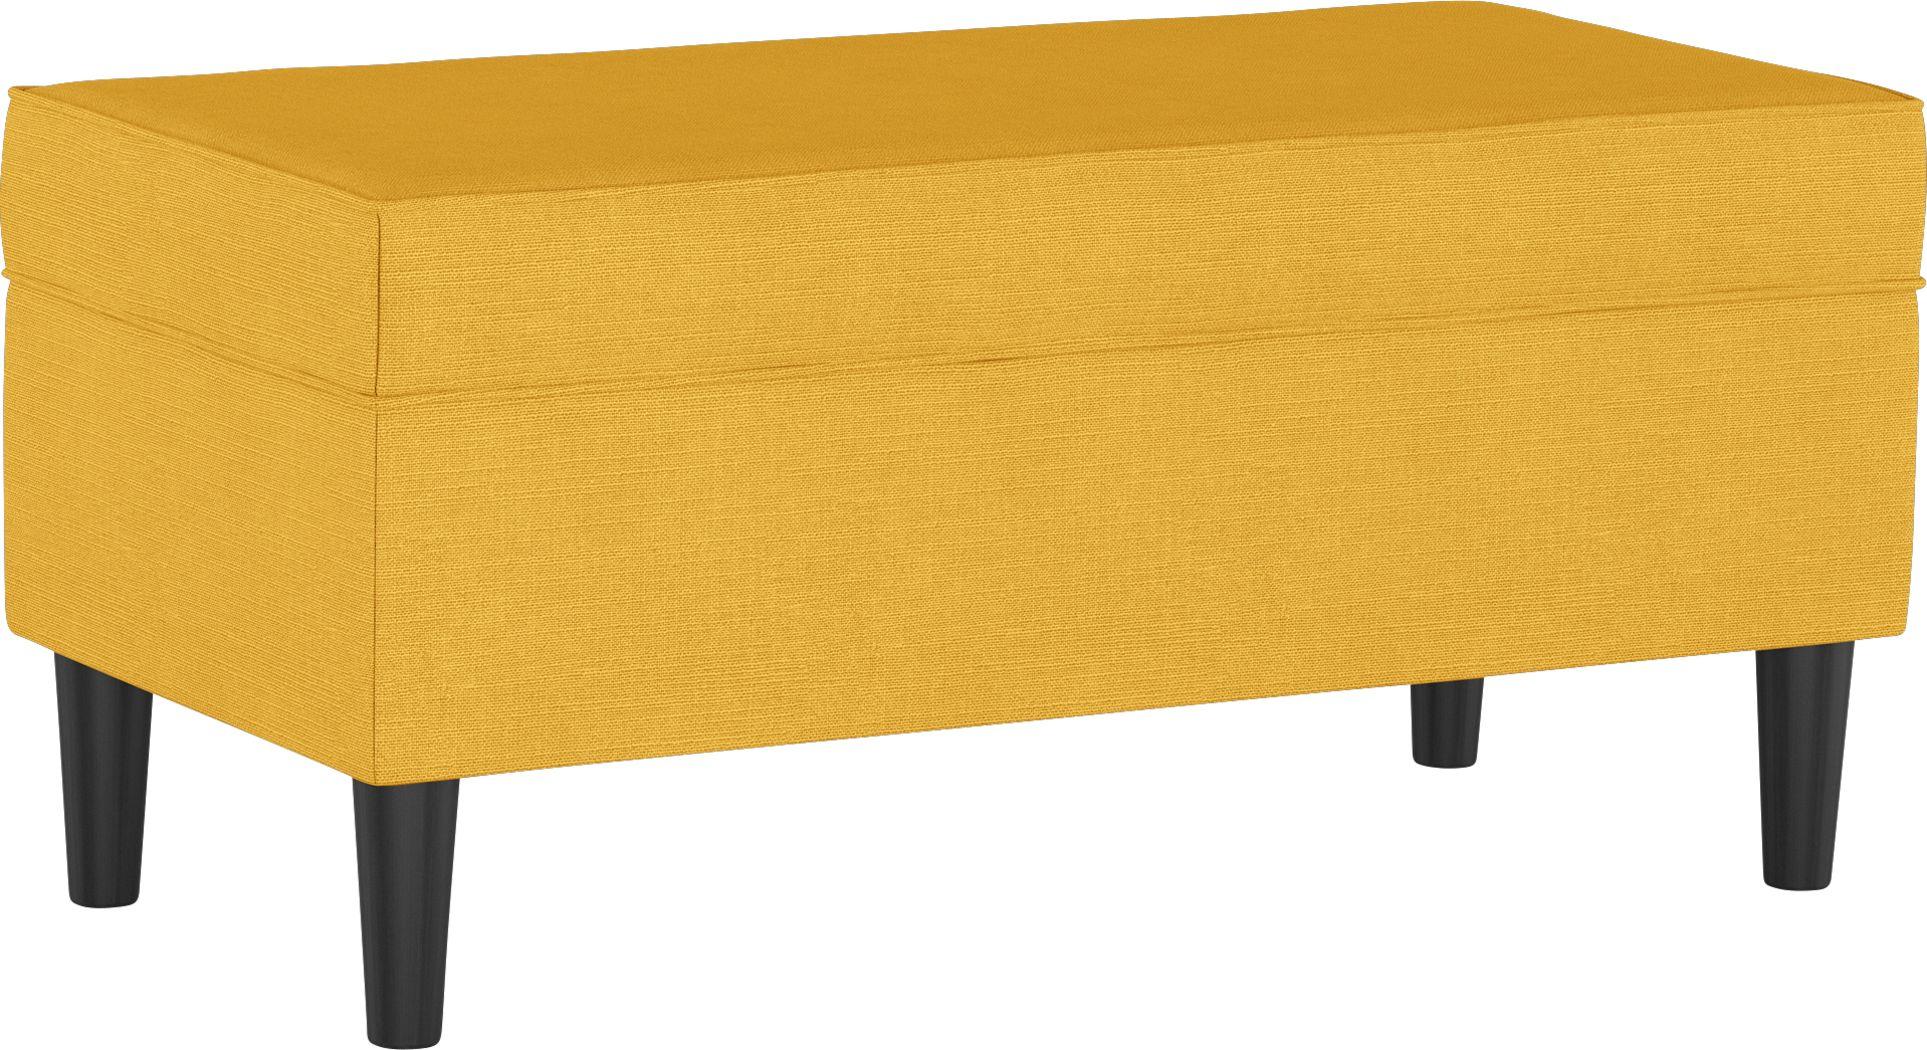 Sweet Plains Yellow Storage Bench